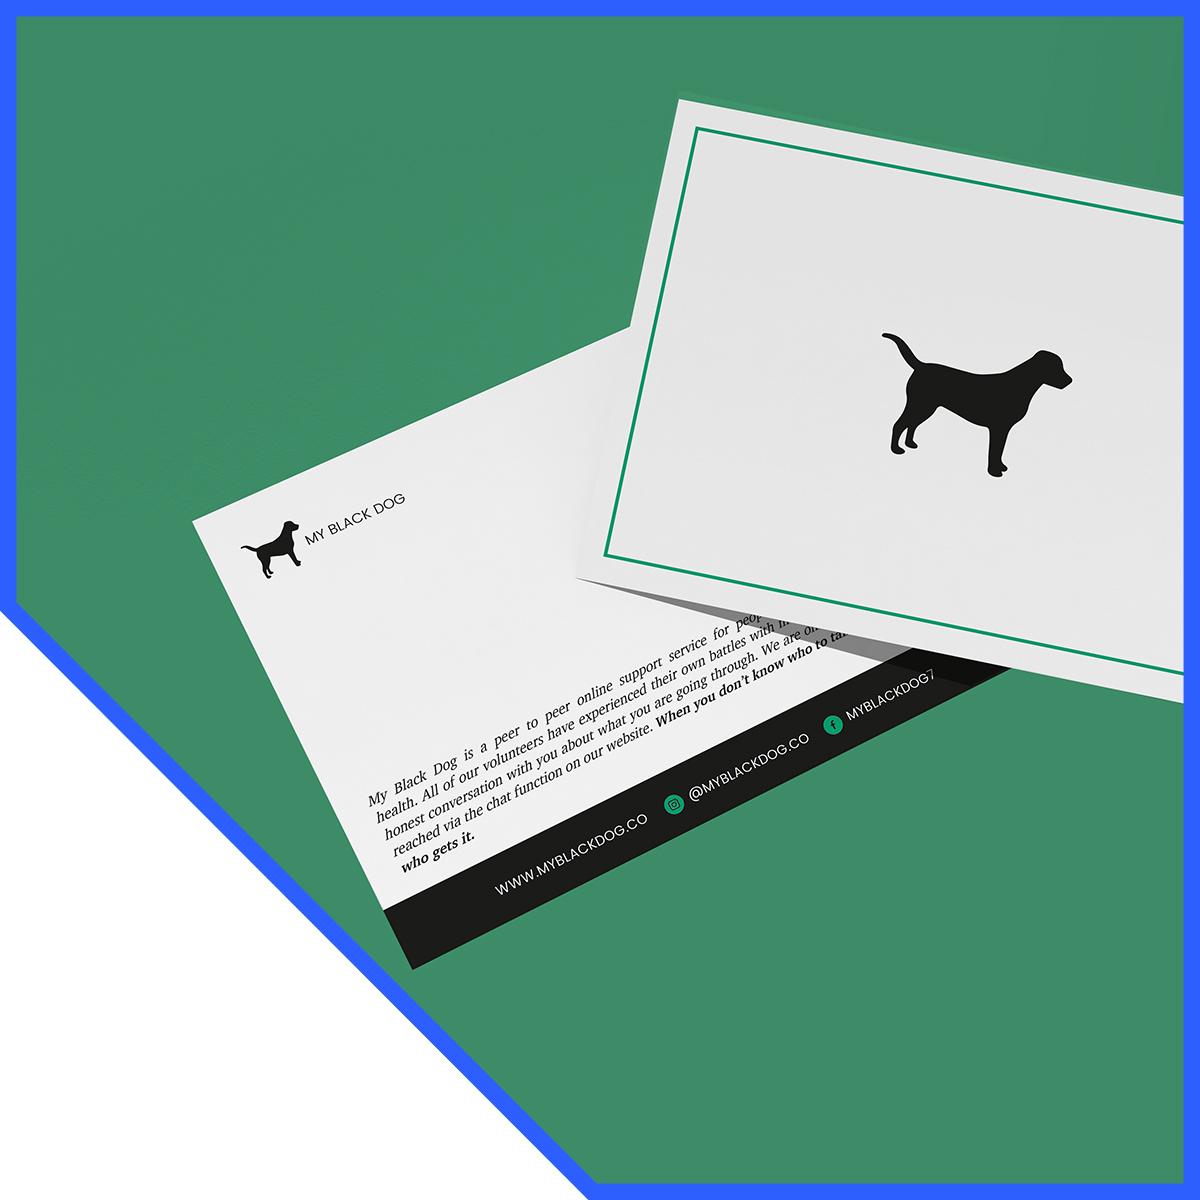 Digital and Print Marketing - Case Study - My Black Dog